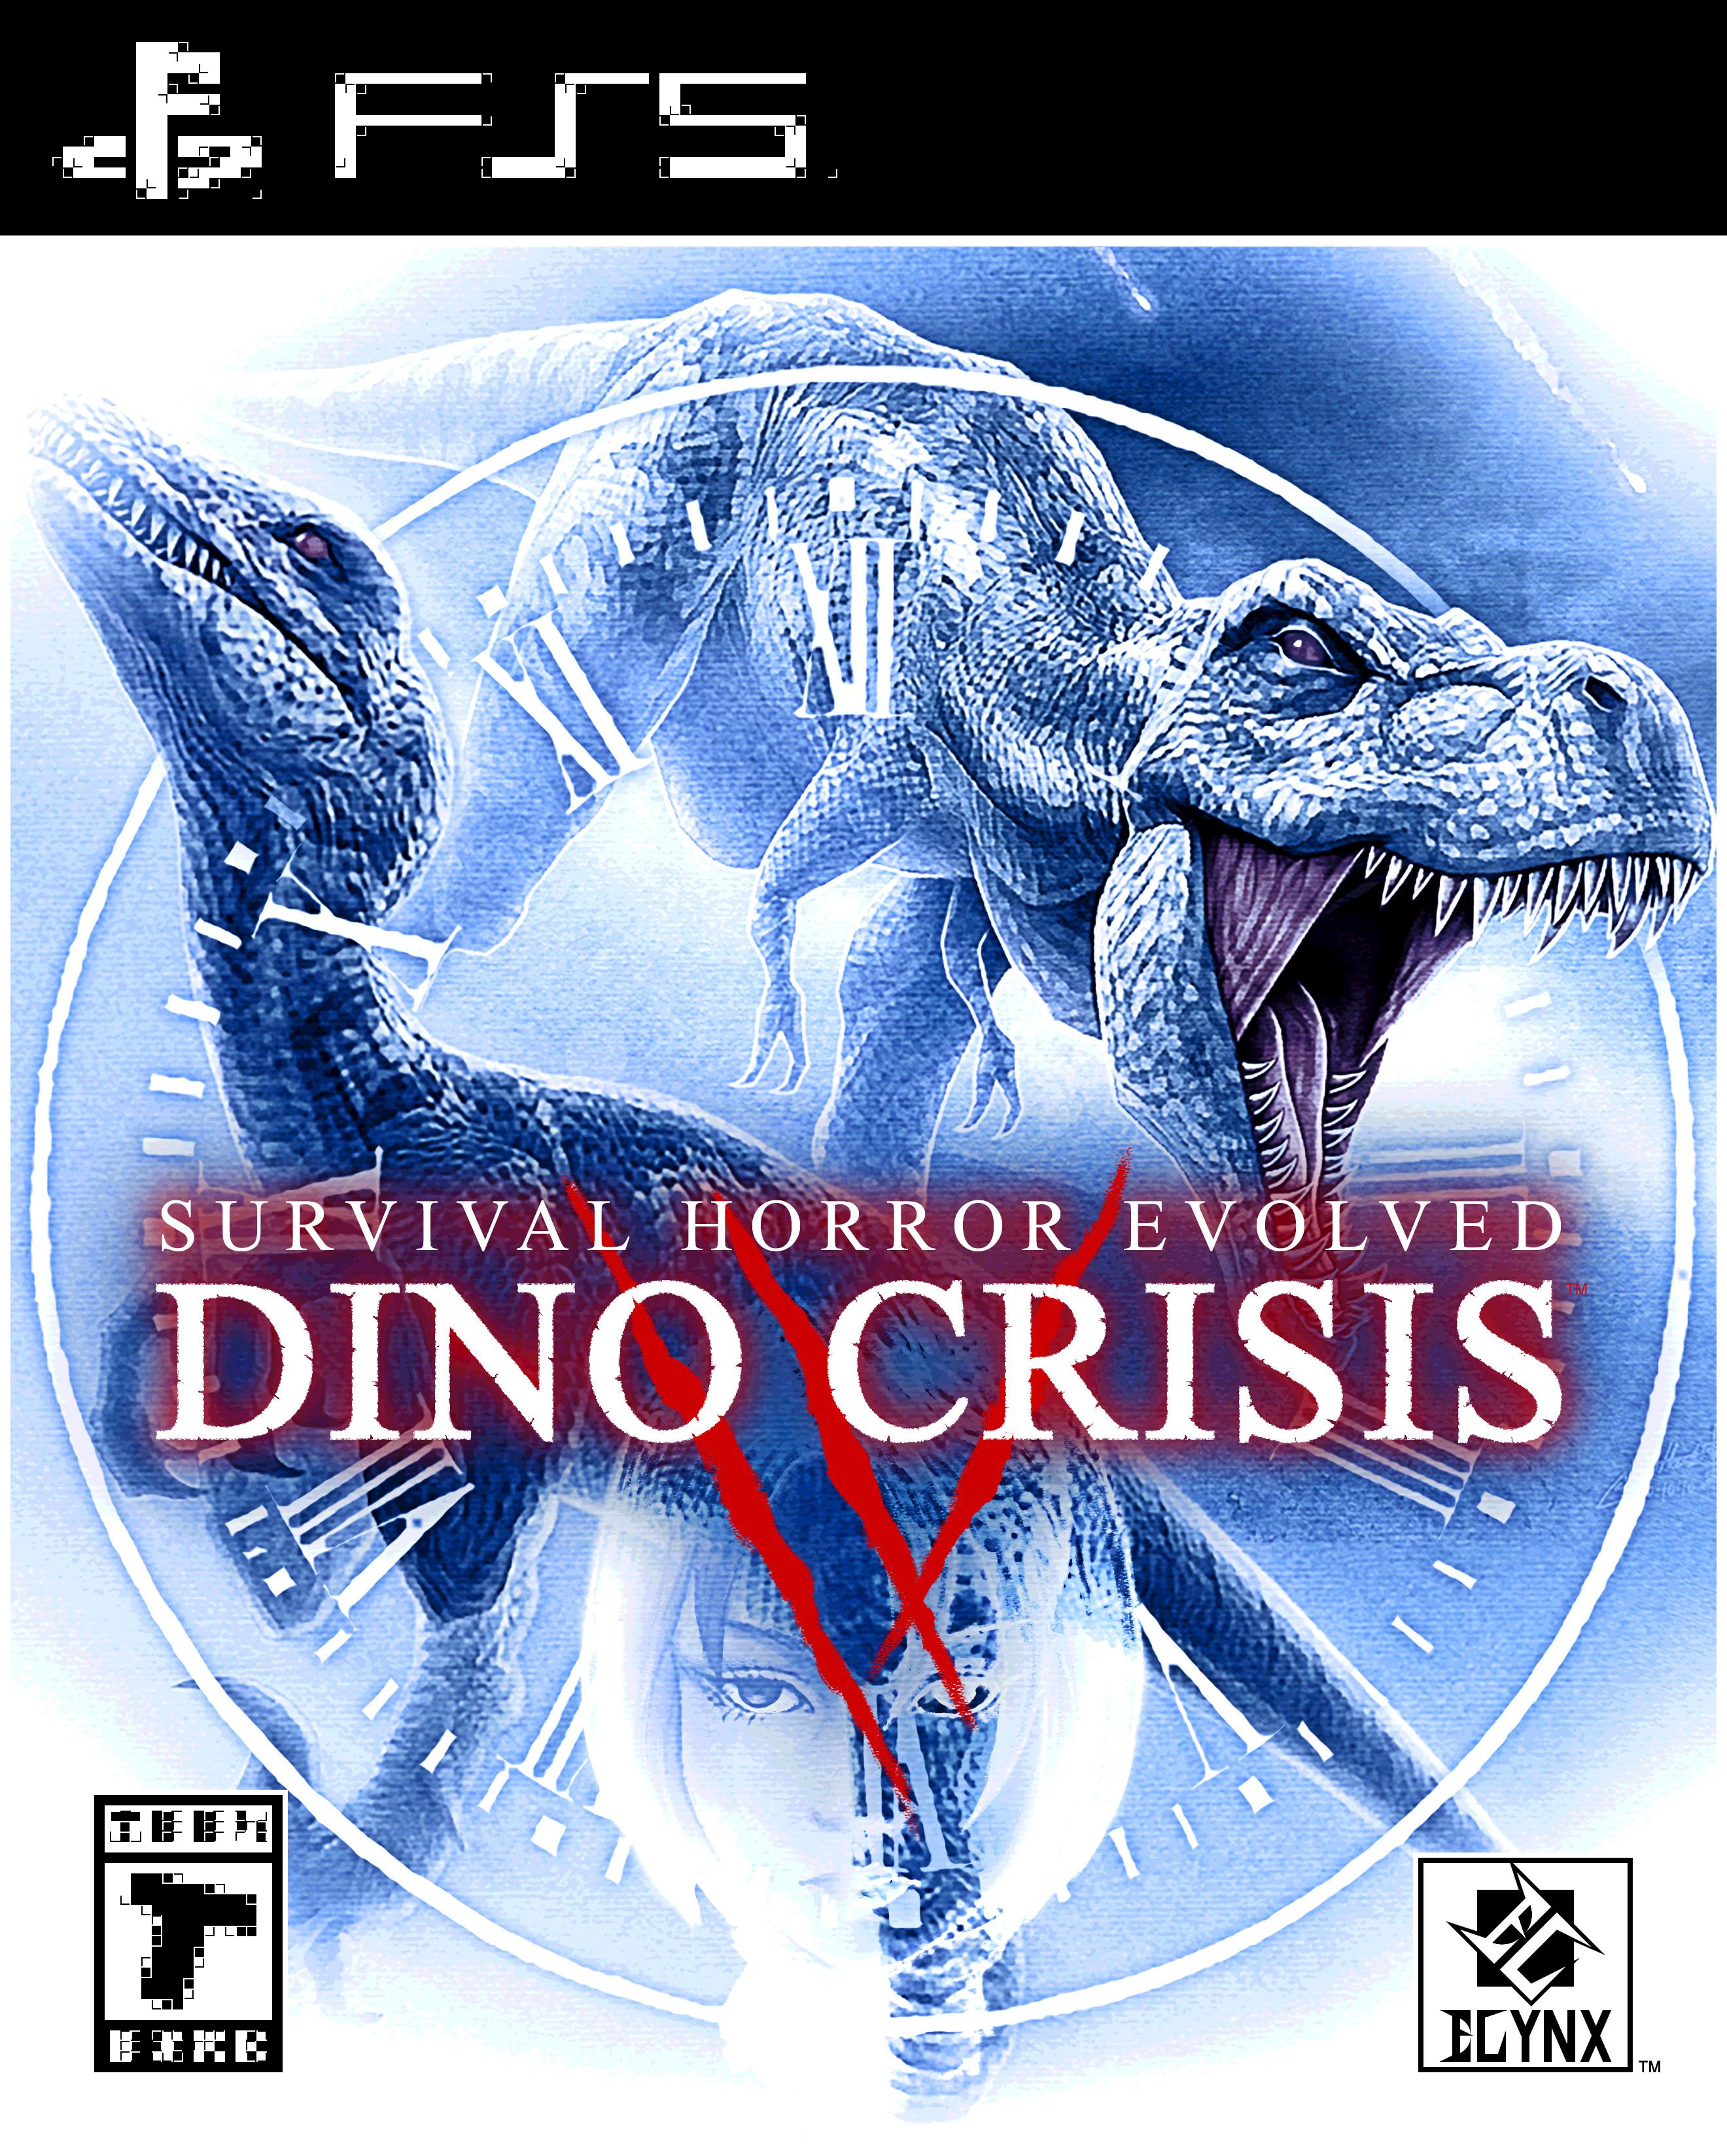 Dino Crisis IV - Box Art Design III